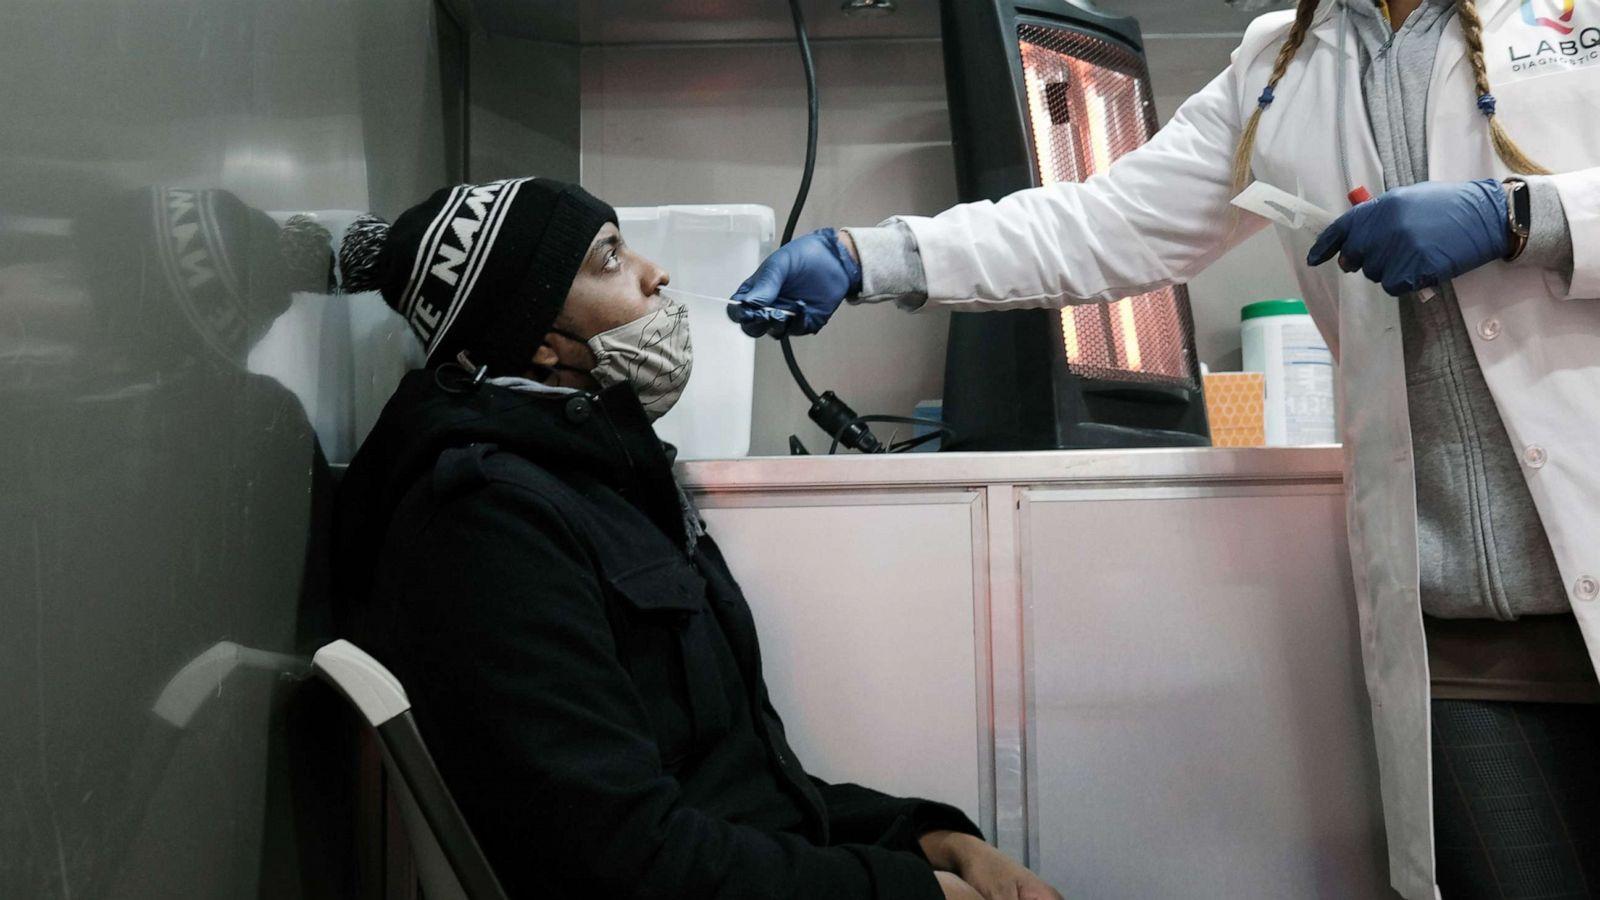 COVID-19 could become a seasonal illness like the flu, experts say - ABC  News